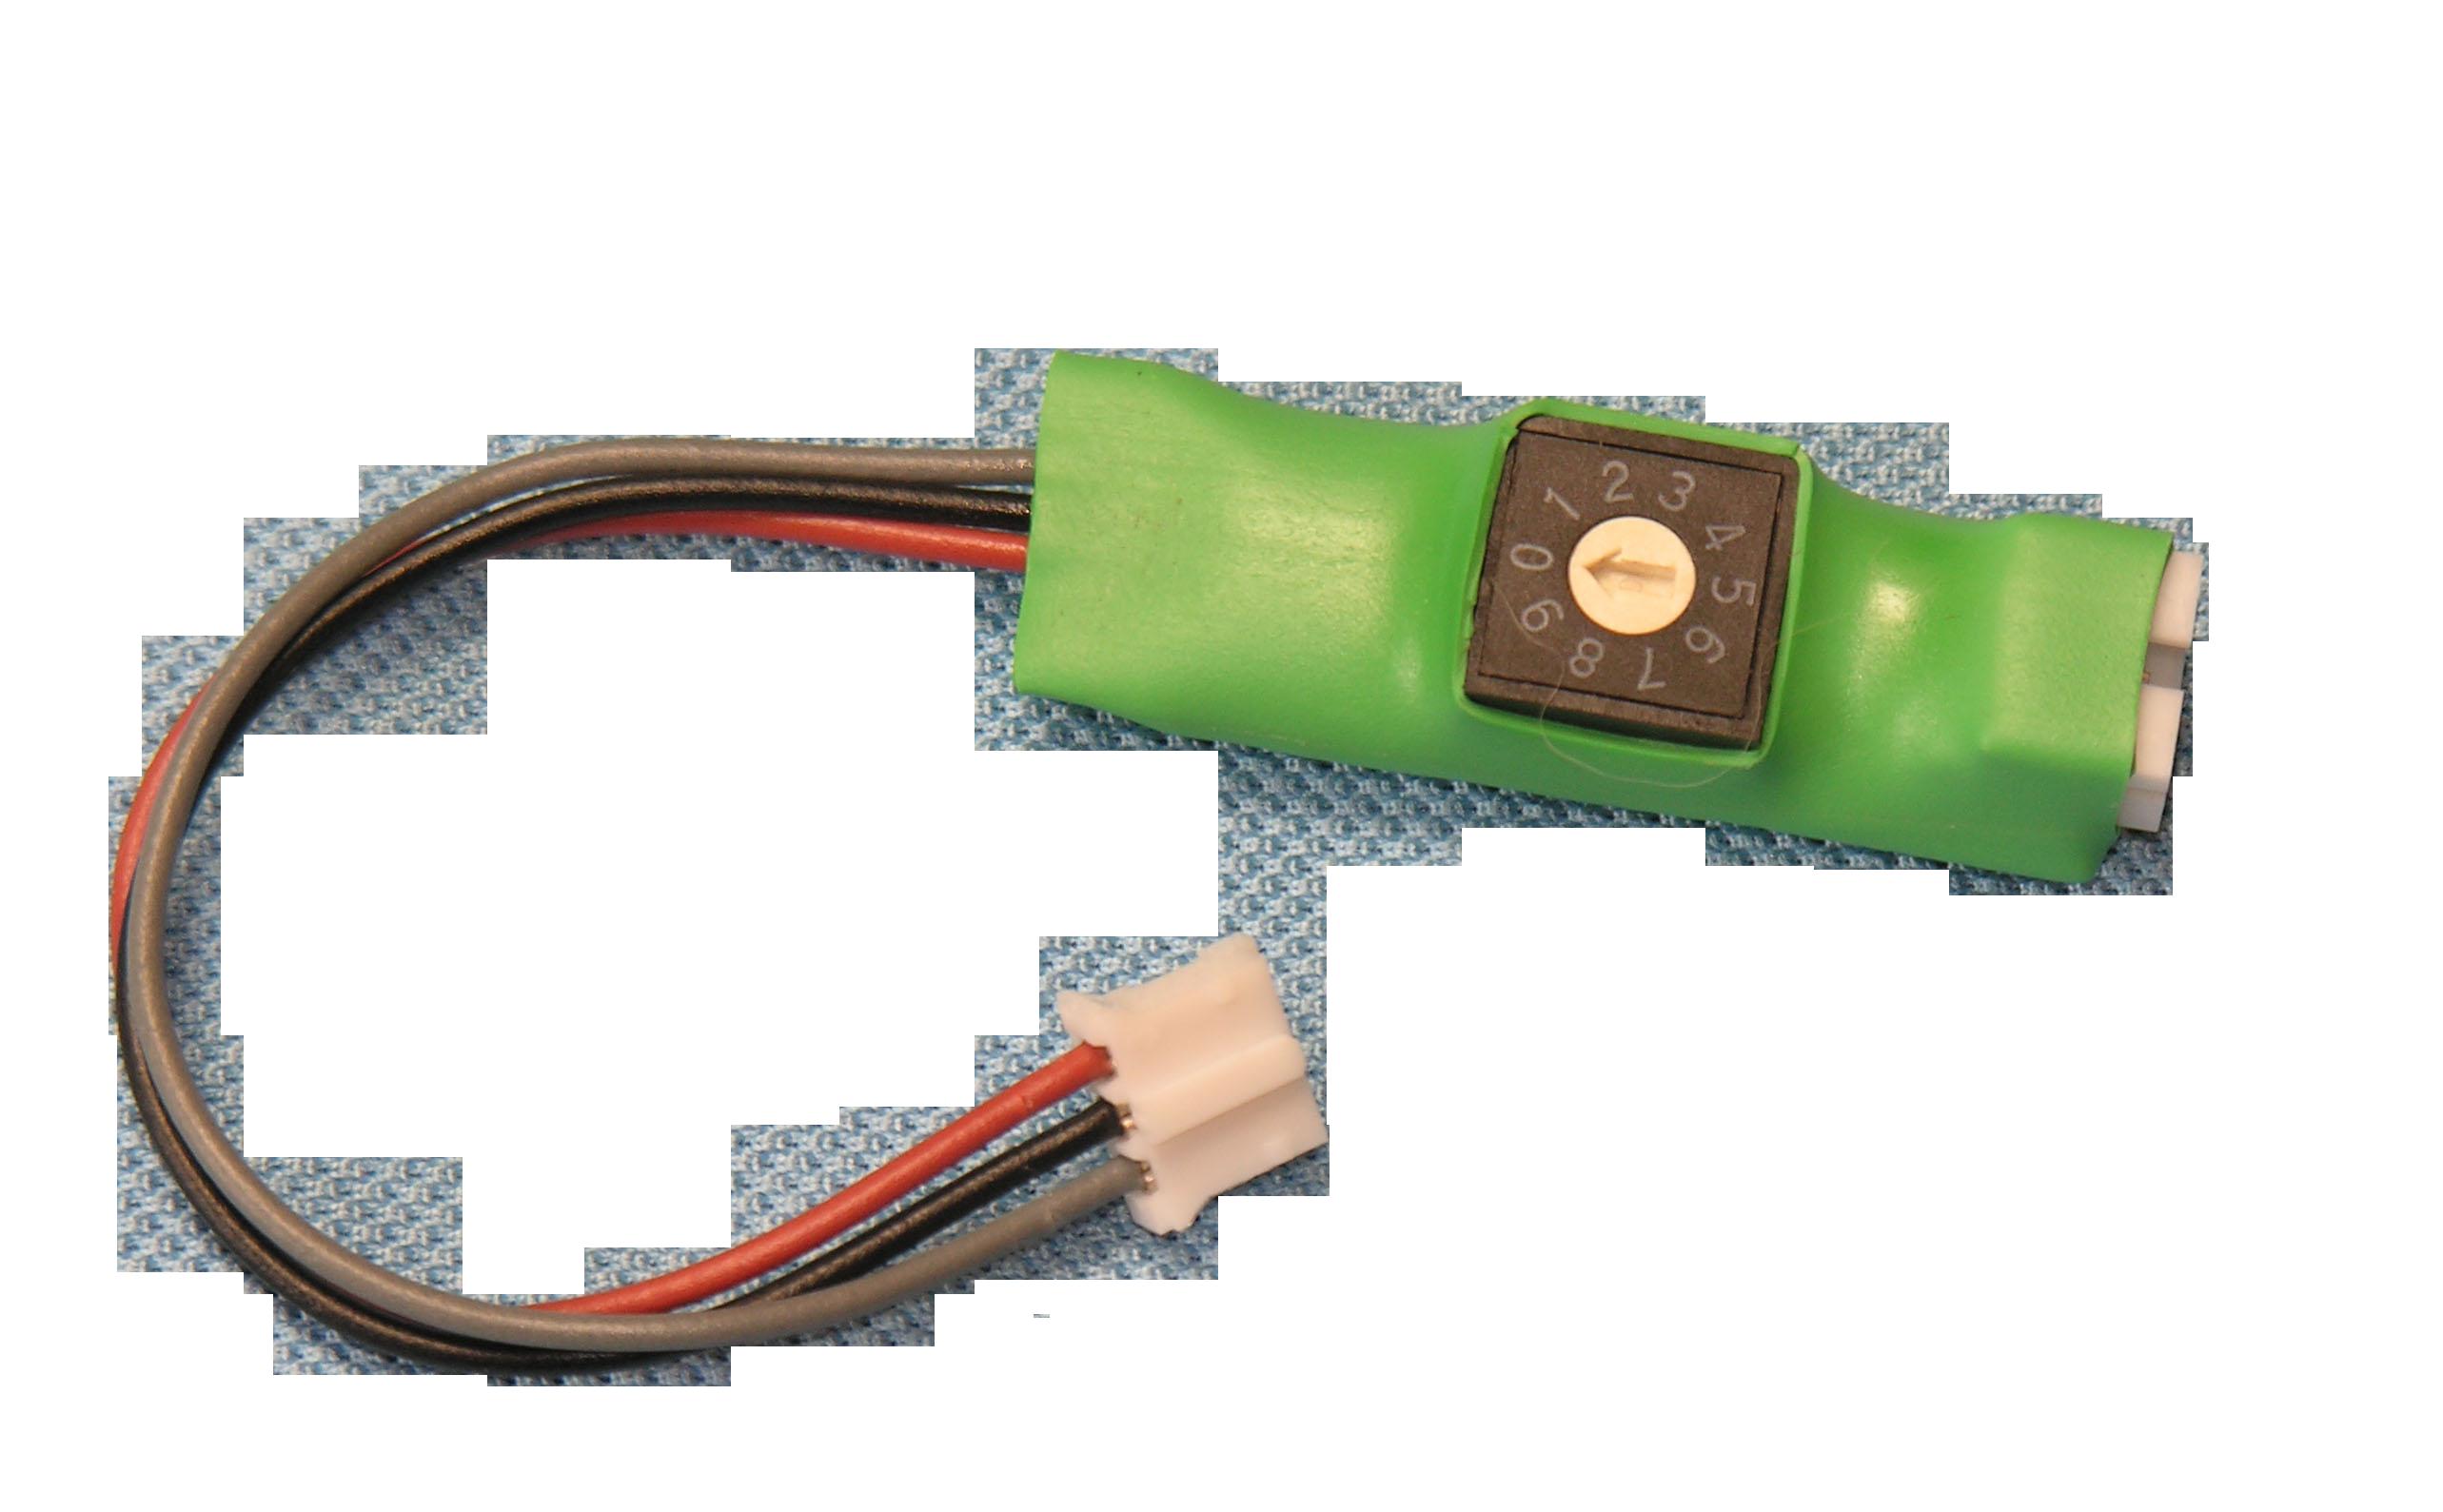 Fan Mod Adjustable Speed Accelerator Controller resist YLOD! eBay #937938